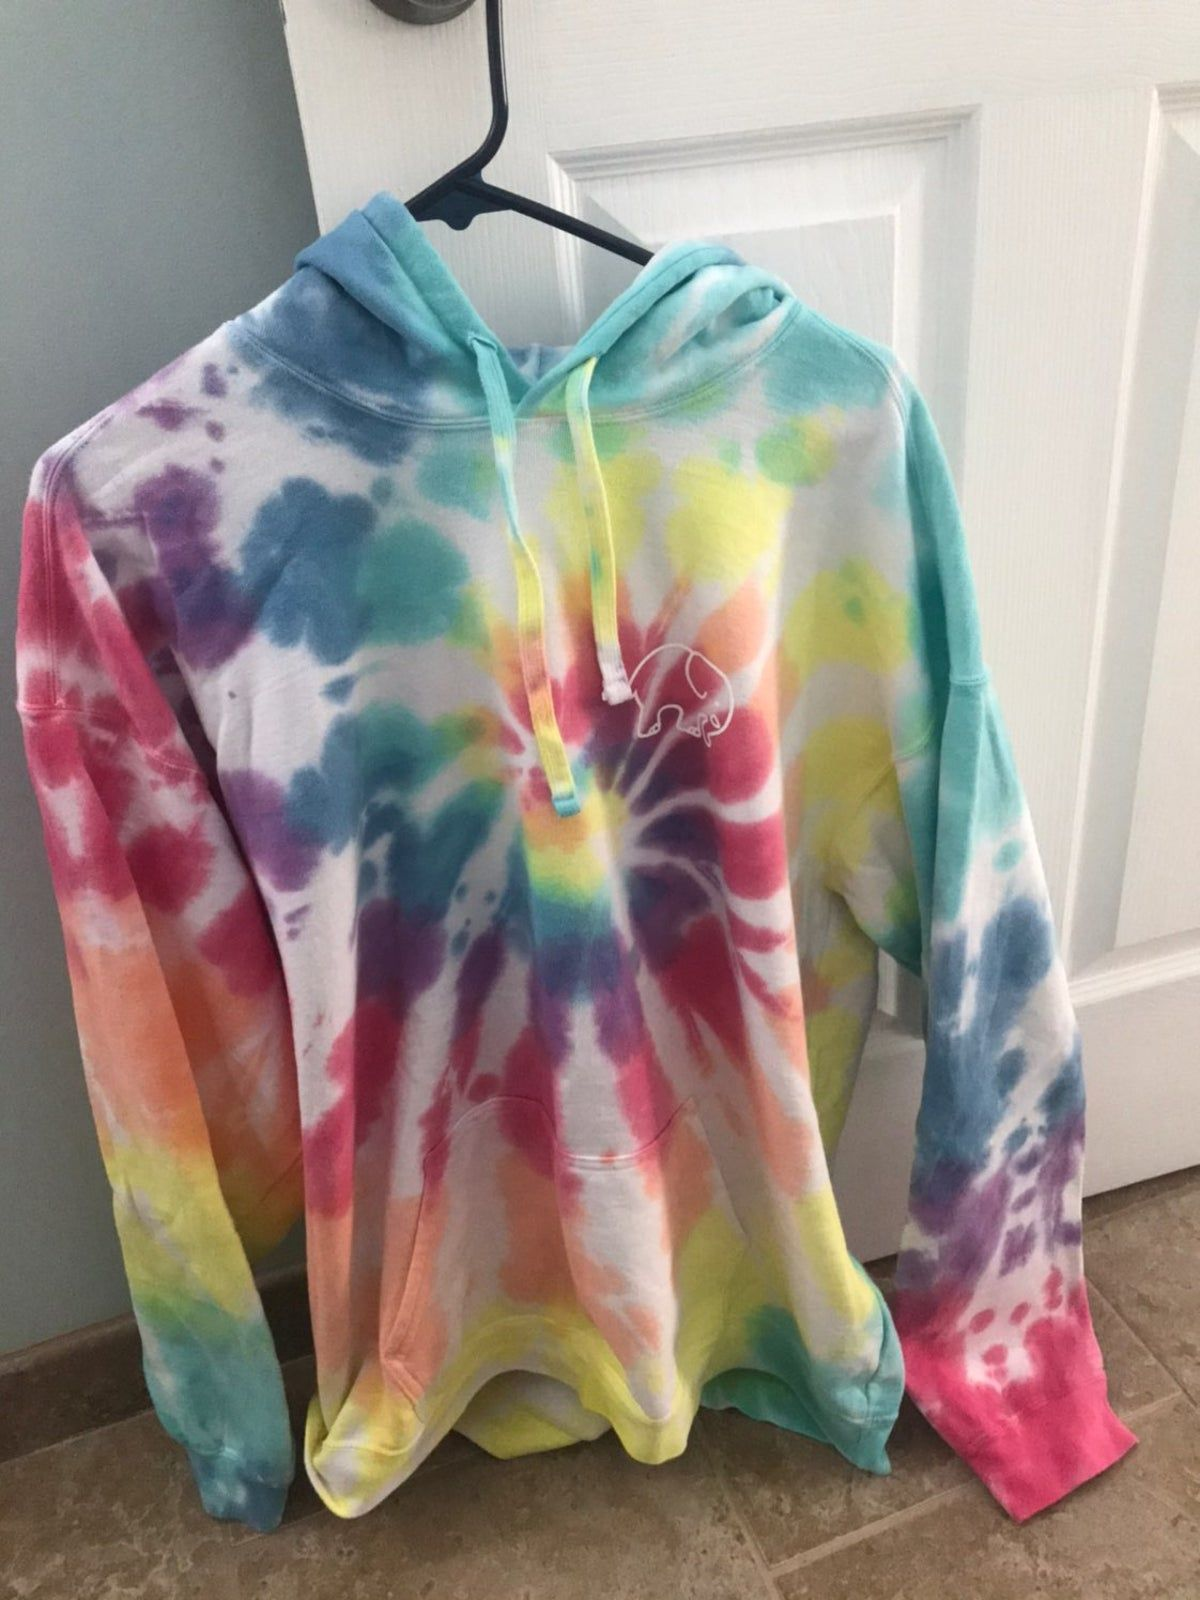 Ivory Ella Tie Dyed Hooded Sweatshirt Xl On Mercari Ivory Ella Sweatshirt Ivory Ella Clothes [ 1600 x 1200 Pixel ]